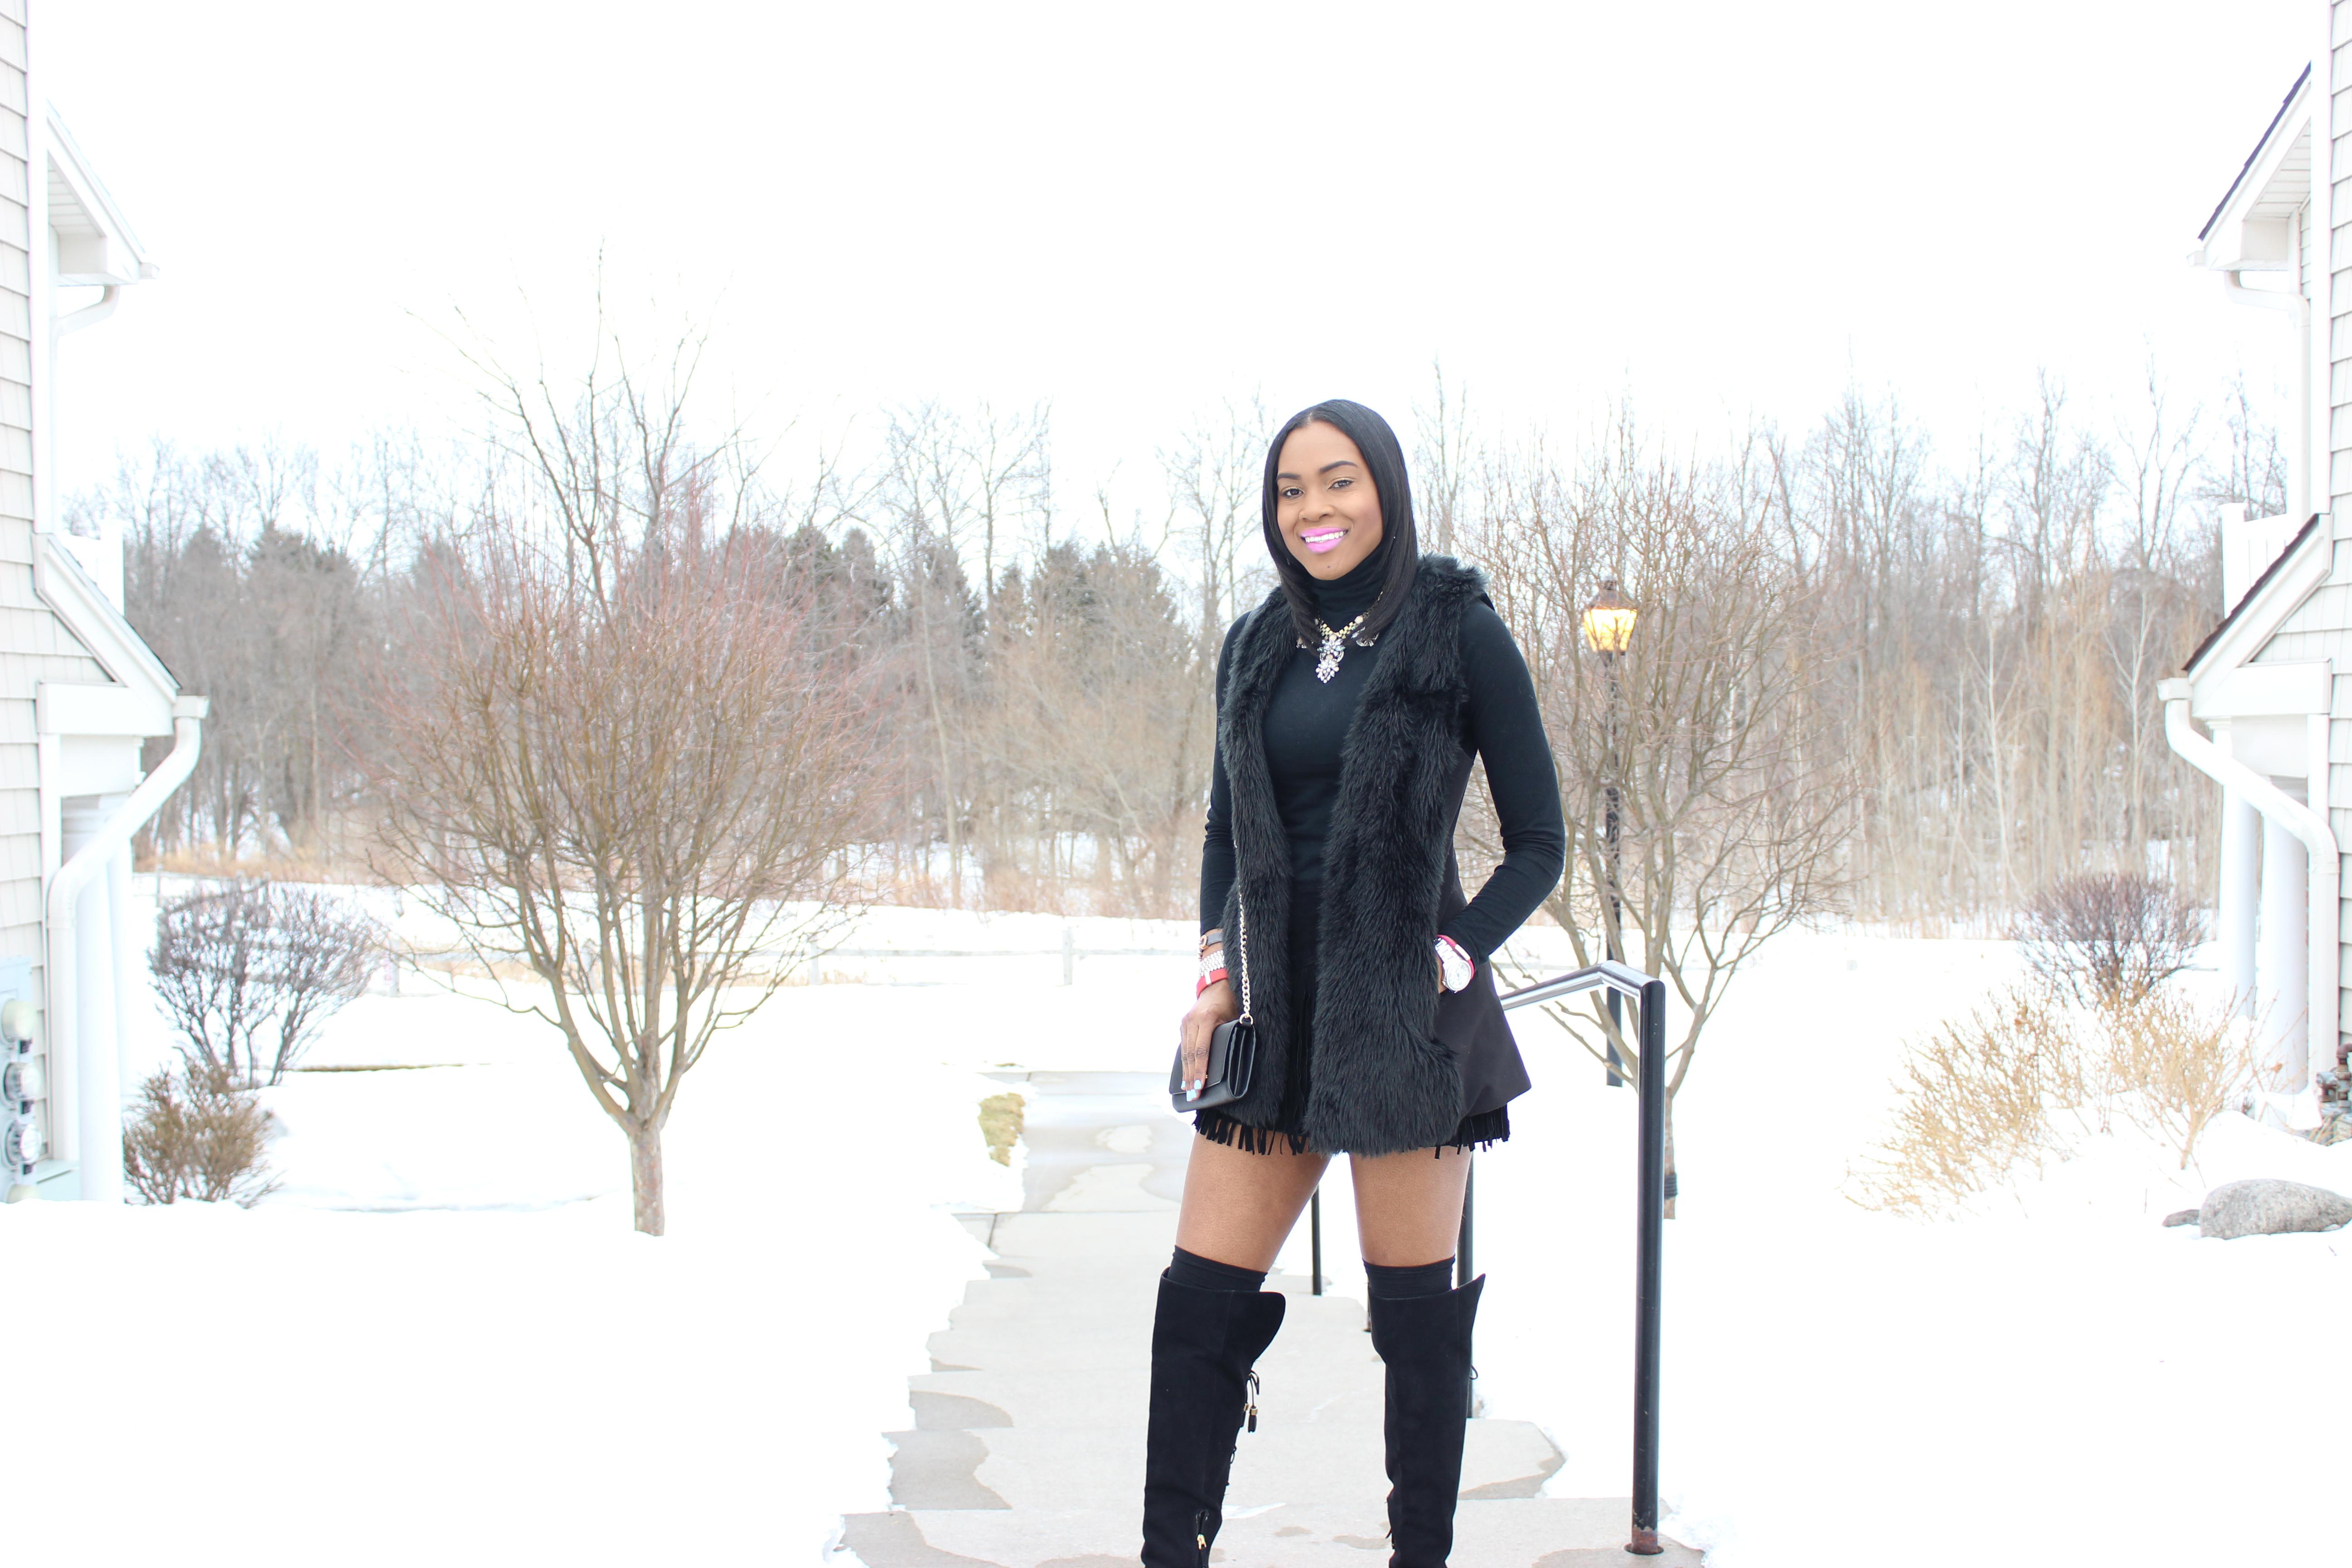 Style-Files-Suede-Fringe-hem-skirt-black-turtleneck-BCBG-Max-Azria- Leather-Sleeve-blazer-Sam-libby-knee-high-boots-Mossimo-faux-fur-vest-6